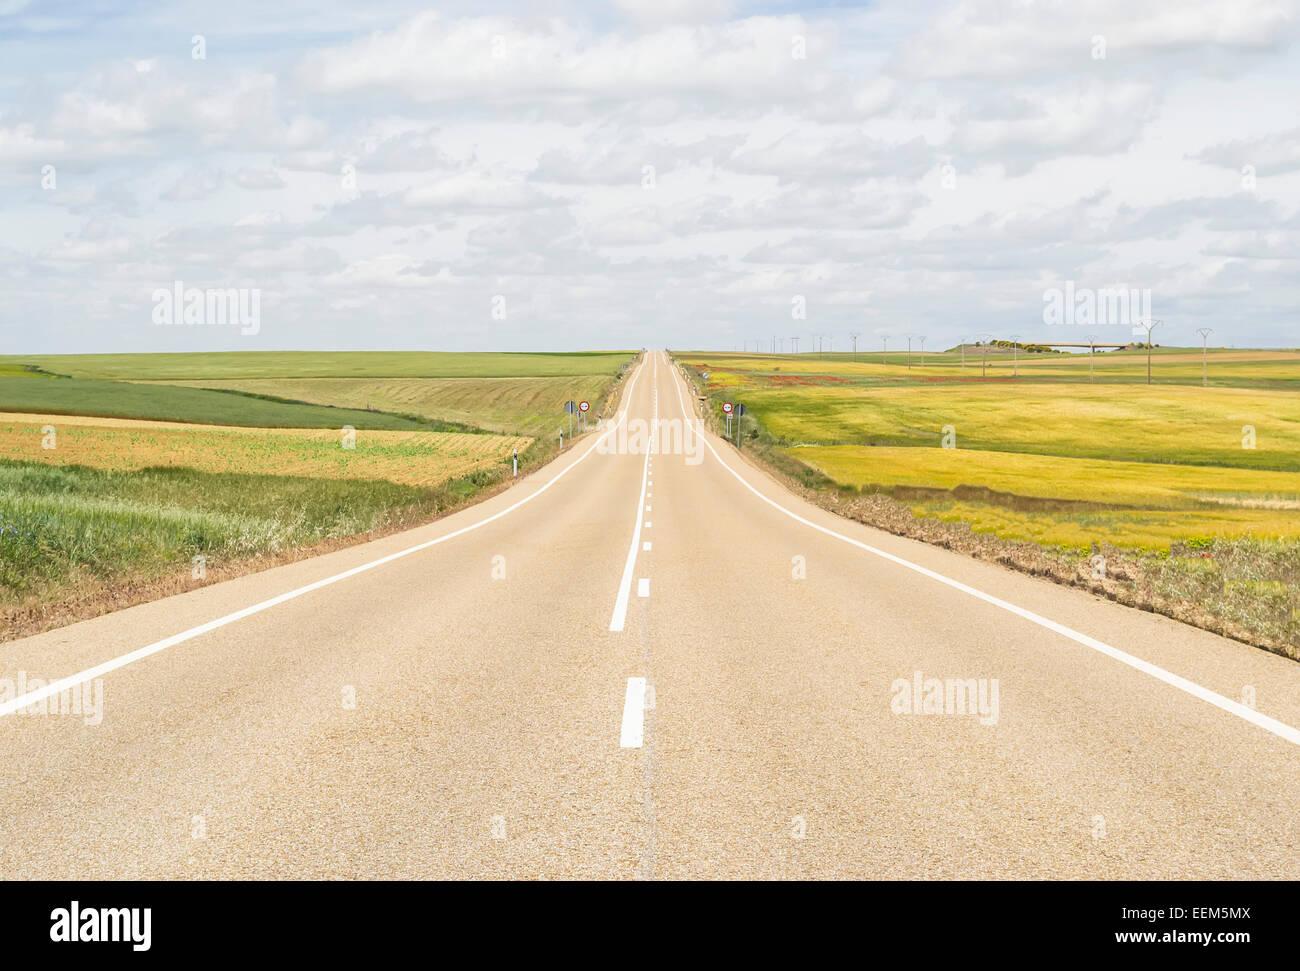 Abrir camino a través de una llanura que nunca parece terminar Foto de stock